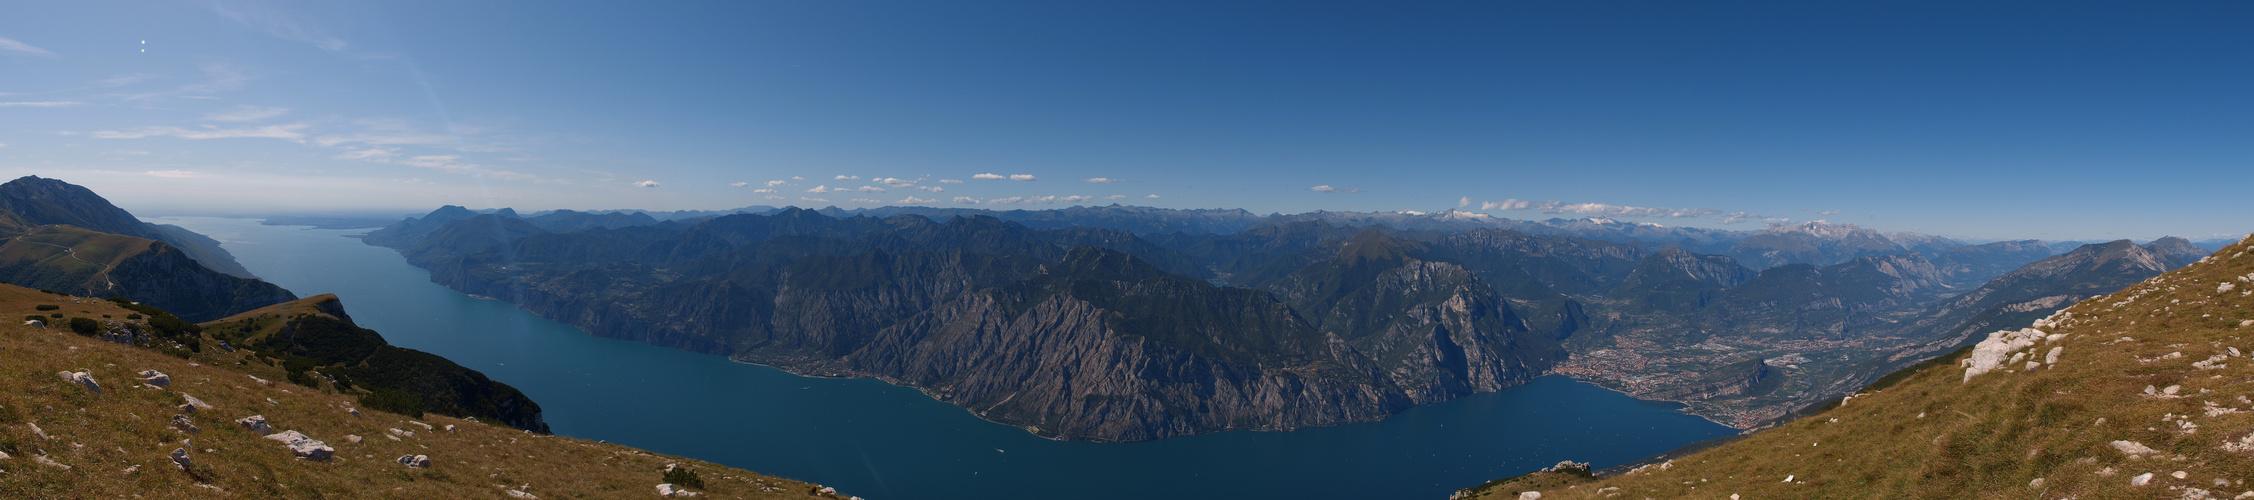 Gardaseepanorama vom Monte Altissimo